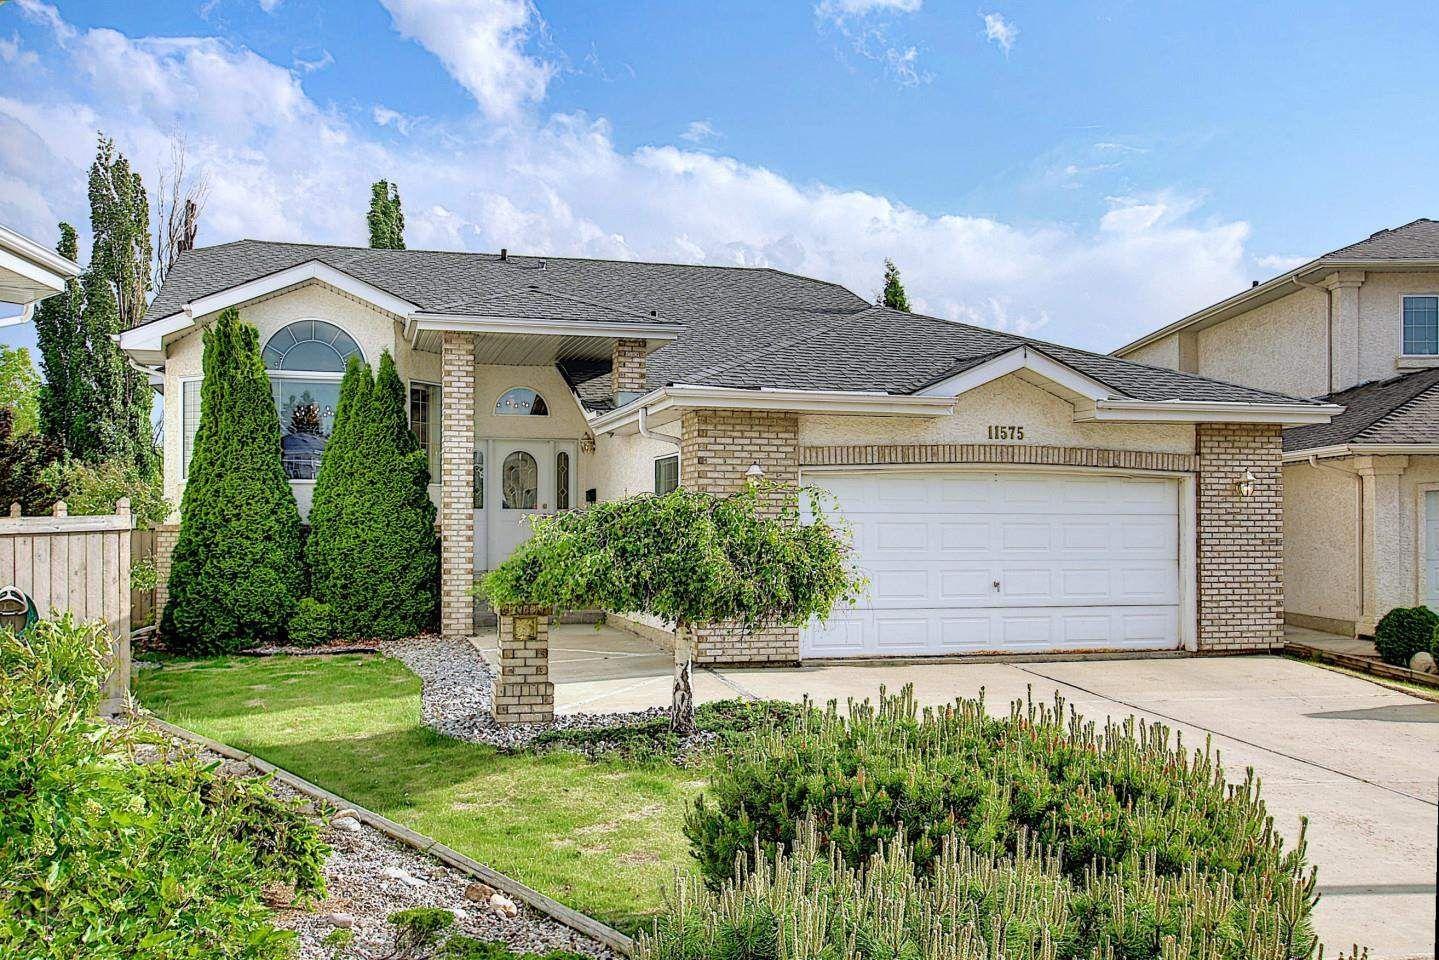 Main Photo: 11575 13 Avenue in Edmonton: Zone 16 House for sale : MLS®# E4248039